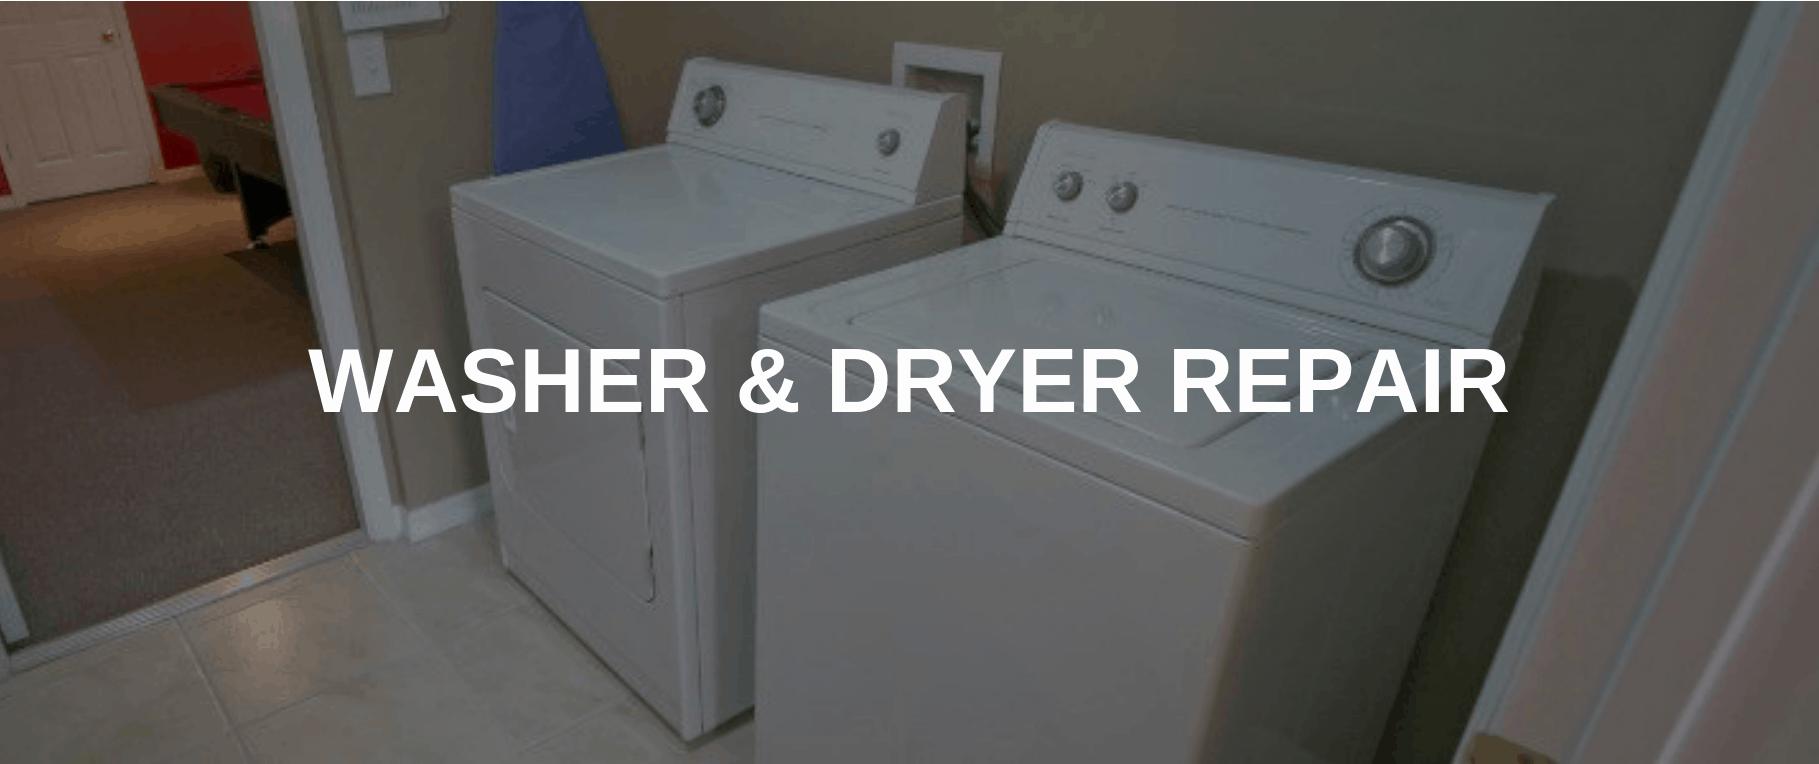 washing machine repair dayton